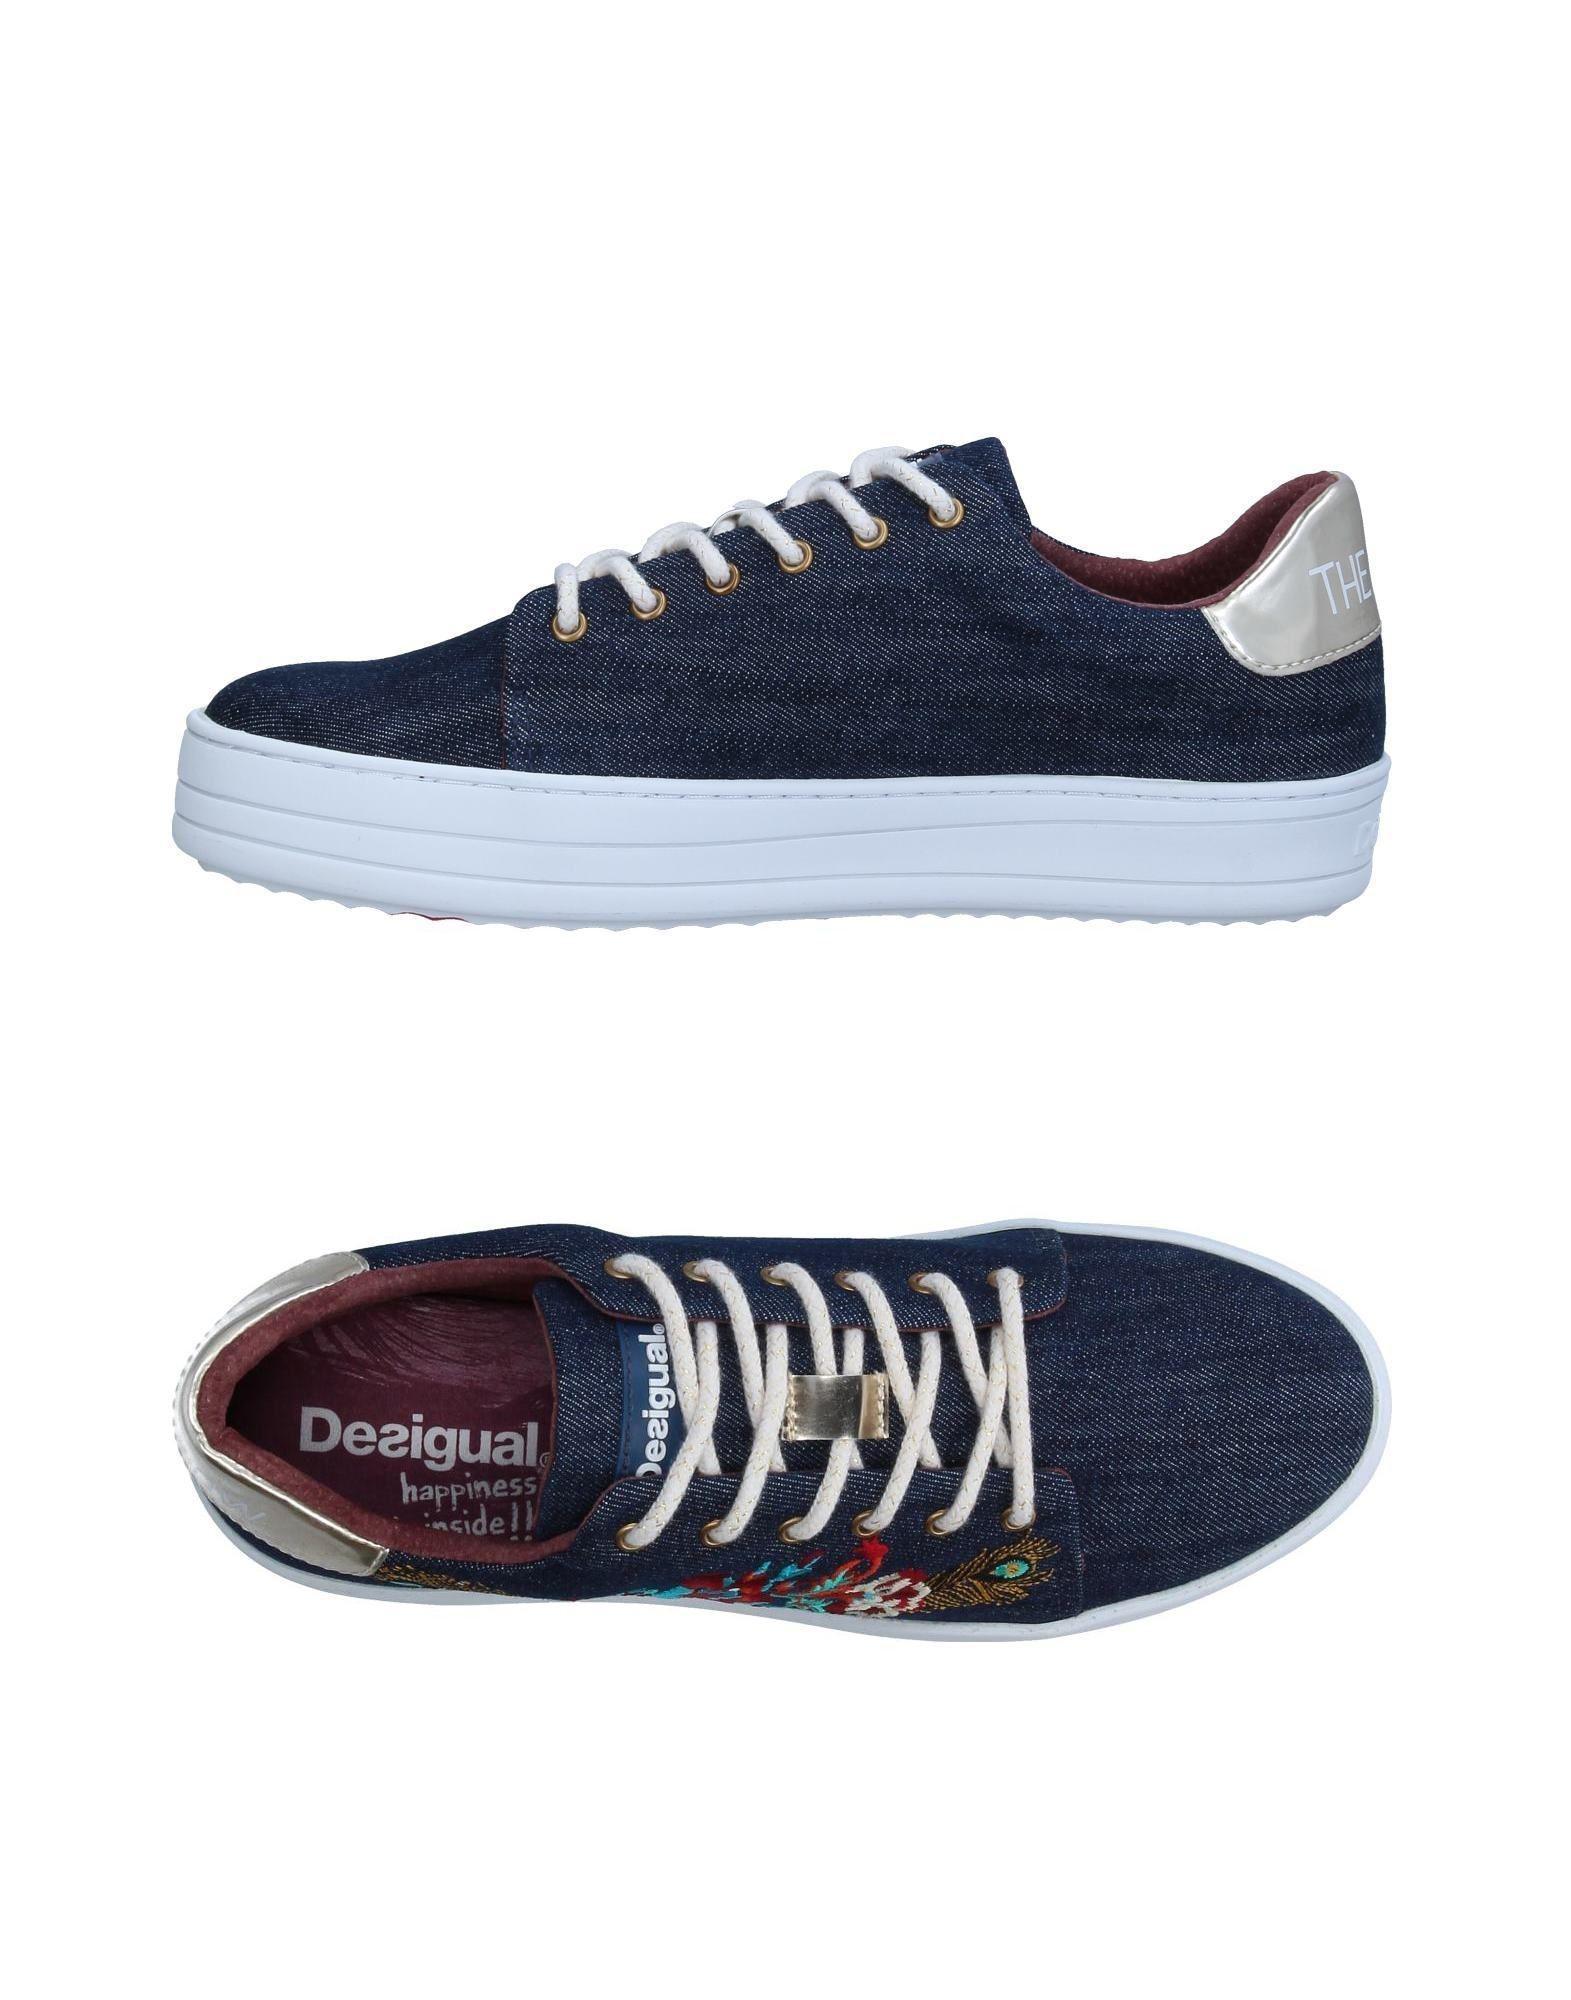 FOOTWEAR - Low-tops & sneakers Desigual eNZeZr